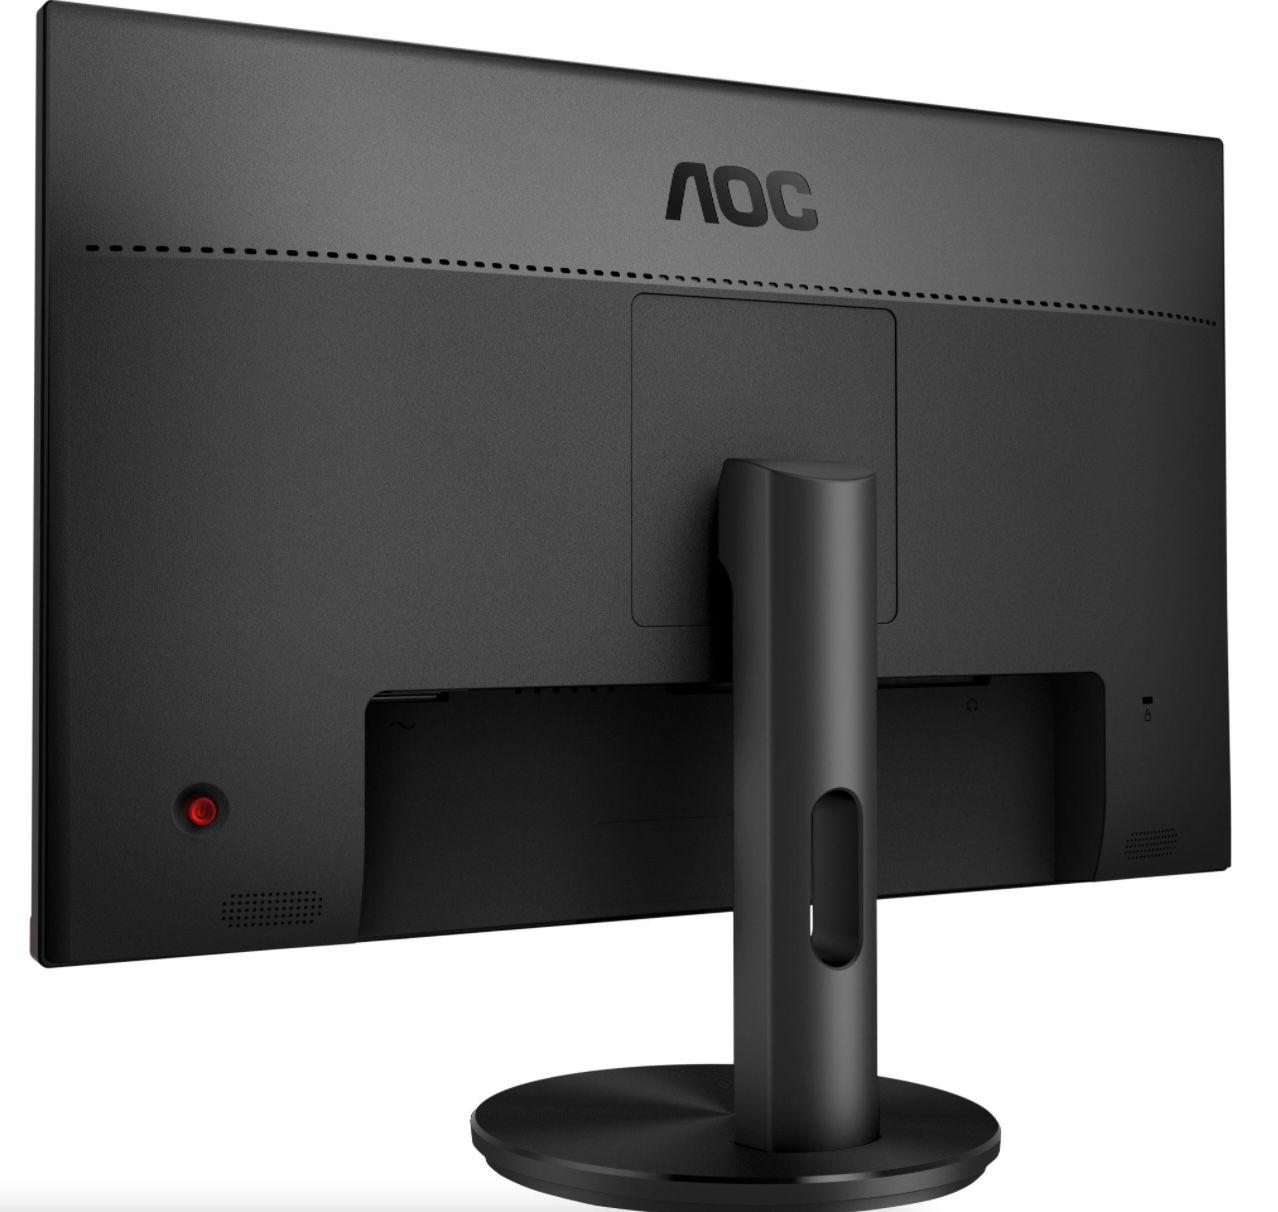 AOC G2490VXA   24 Zoll Full HD Monitor mit VA Panel + 144 Hz für 154,95€ (statt 200€)